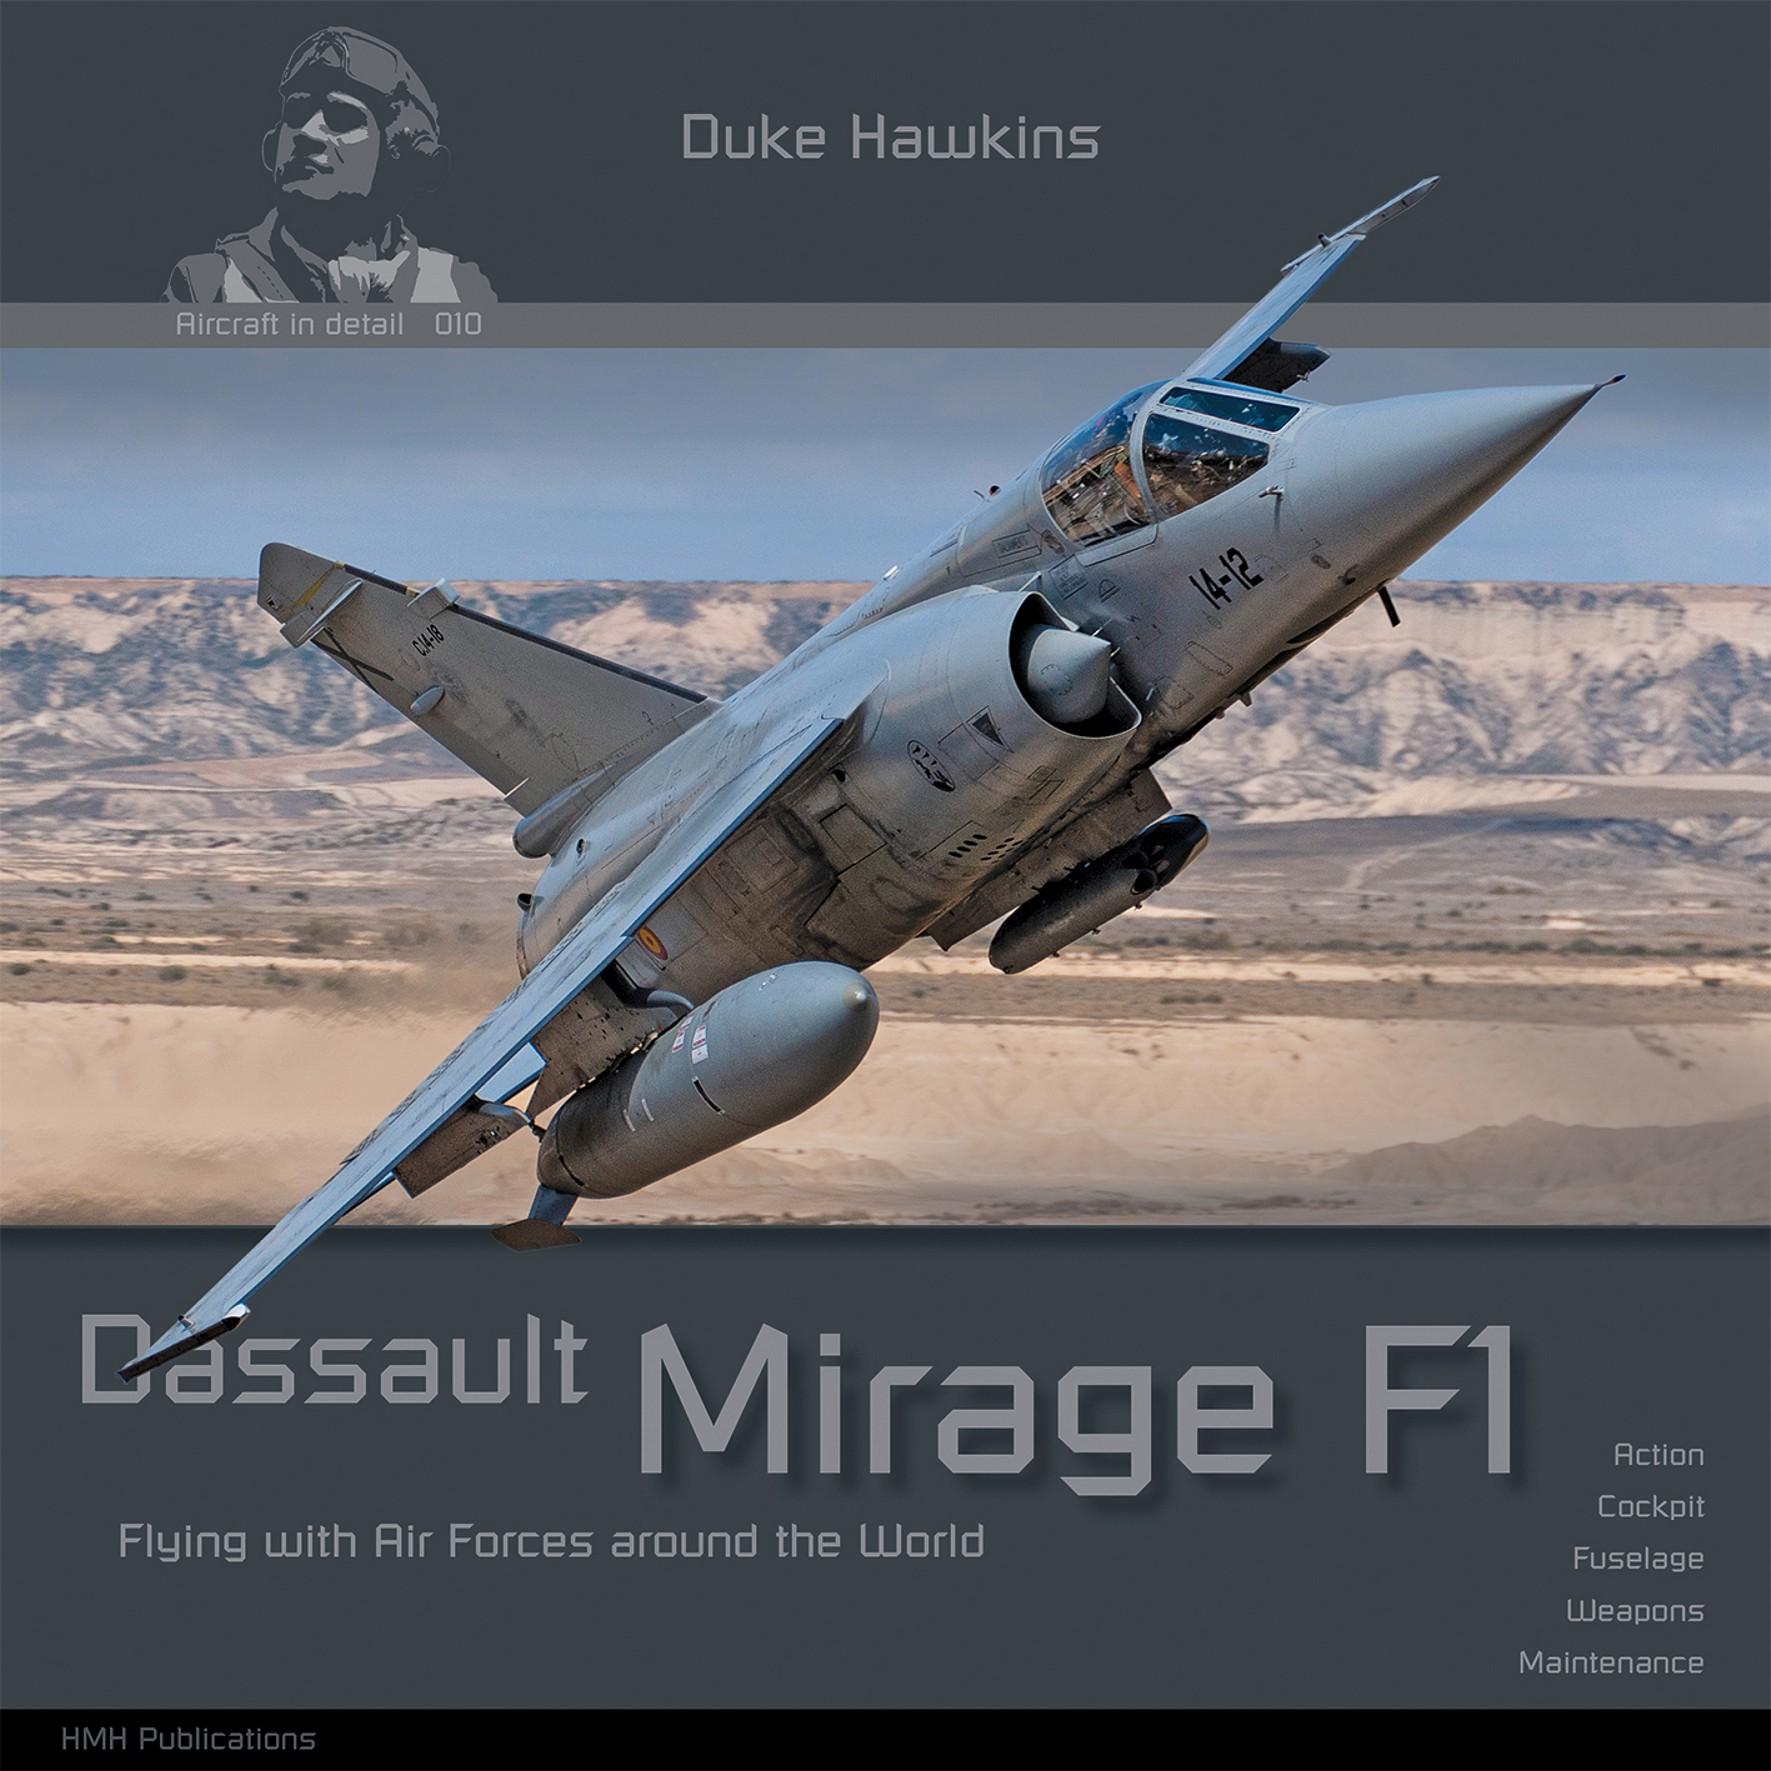 Duke Hawkins10: Dassault Mirage F.1